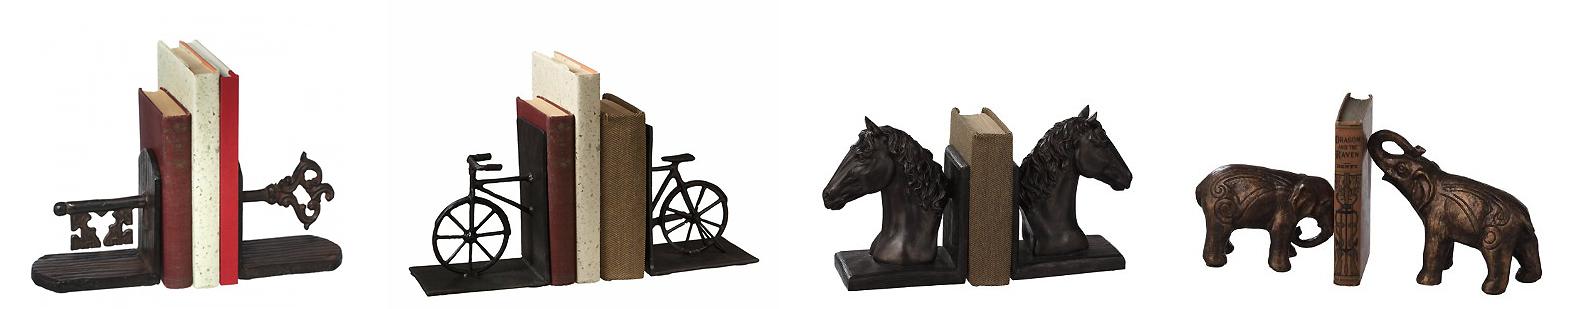 Sculpture Bookends